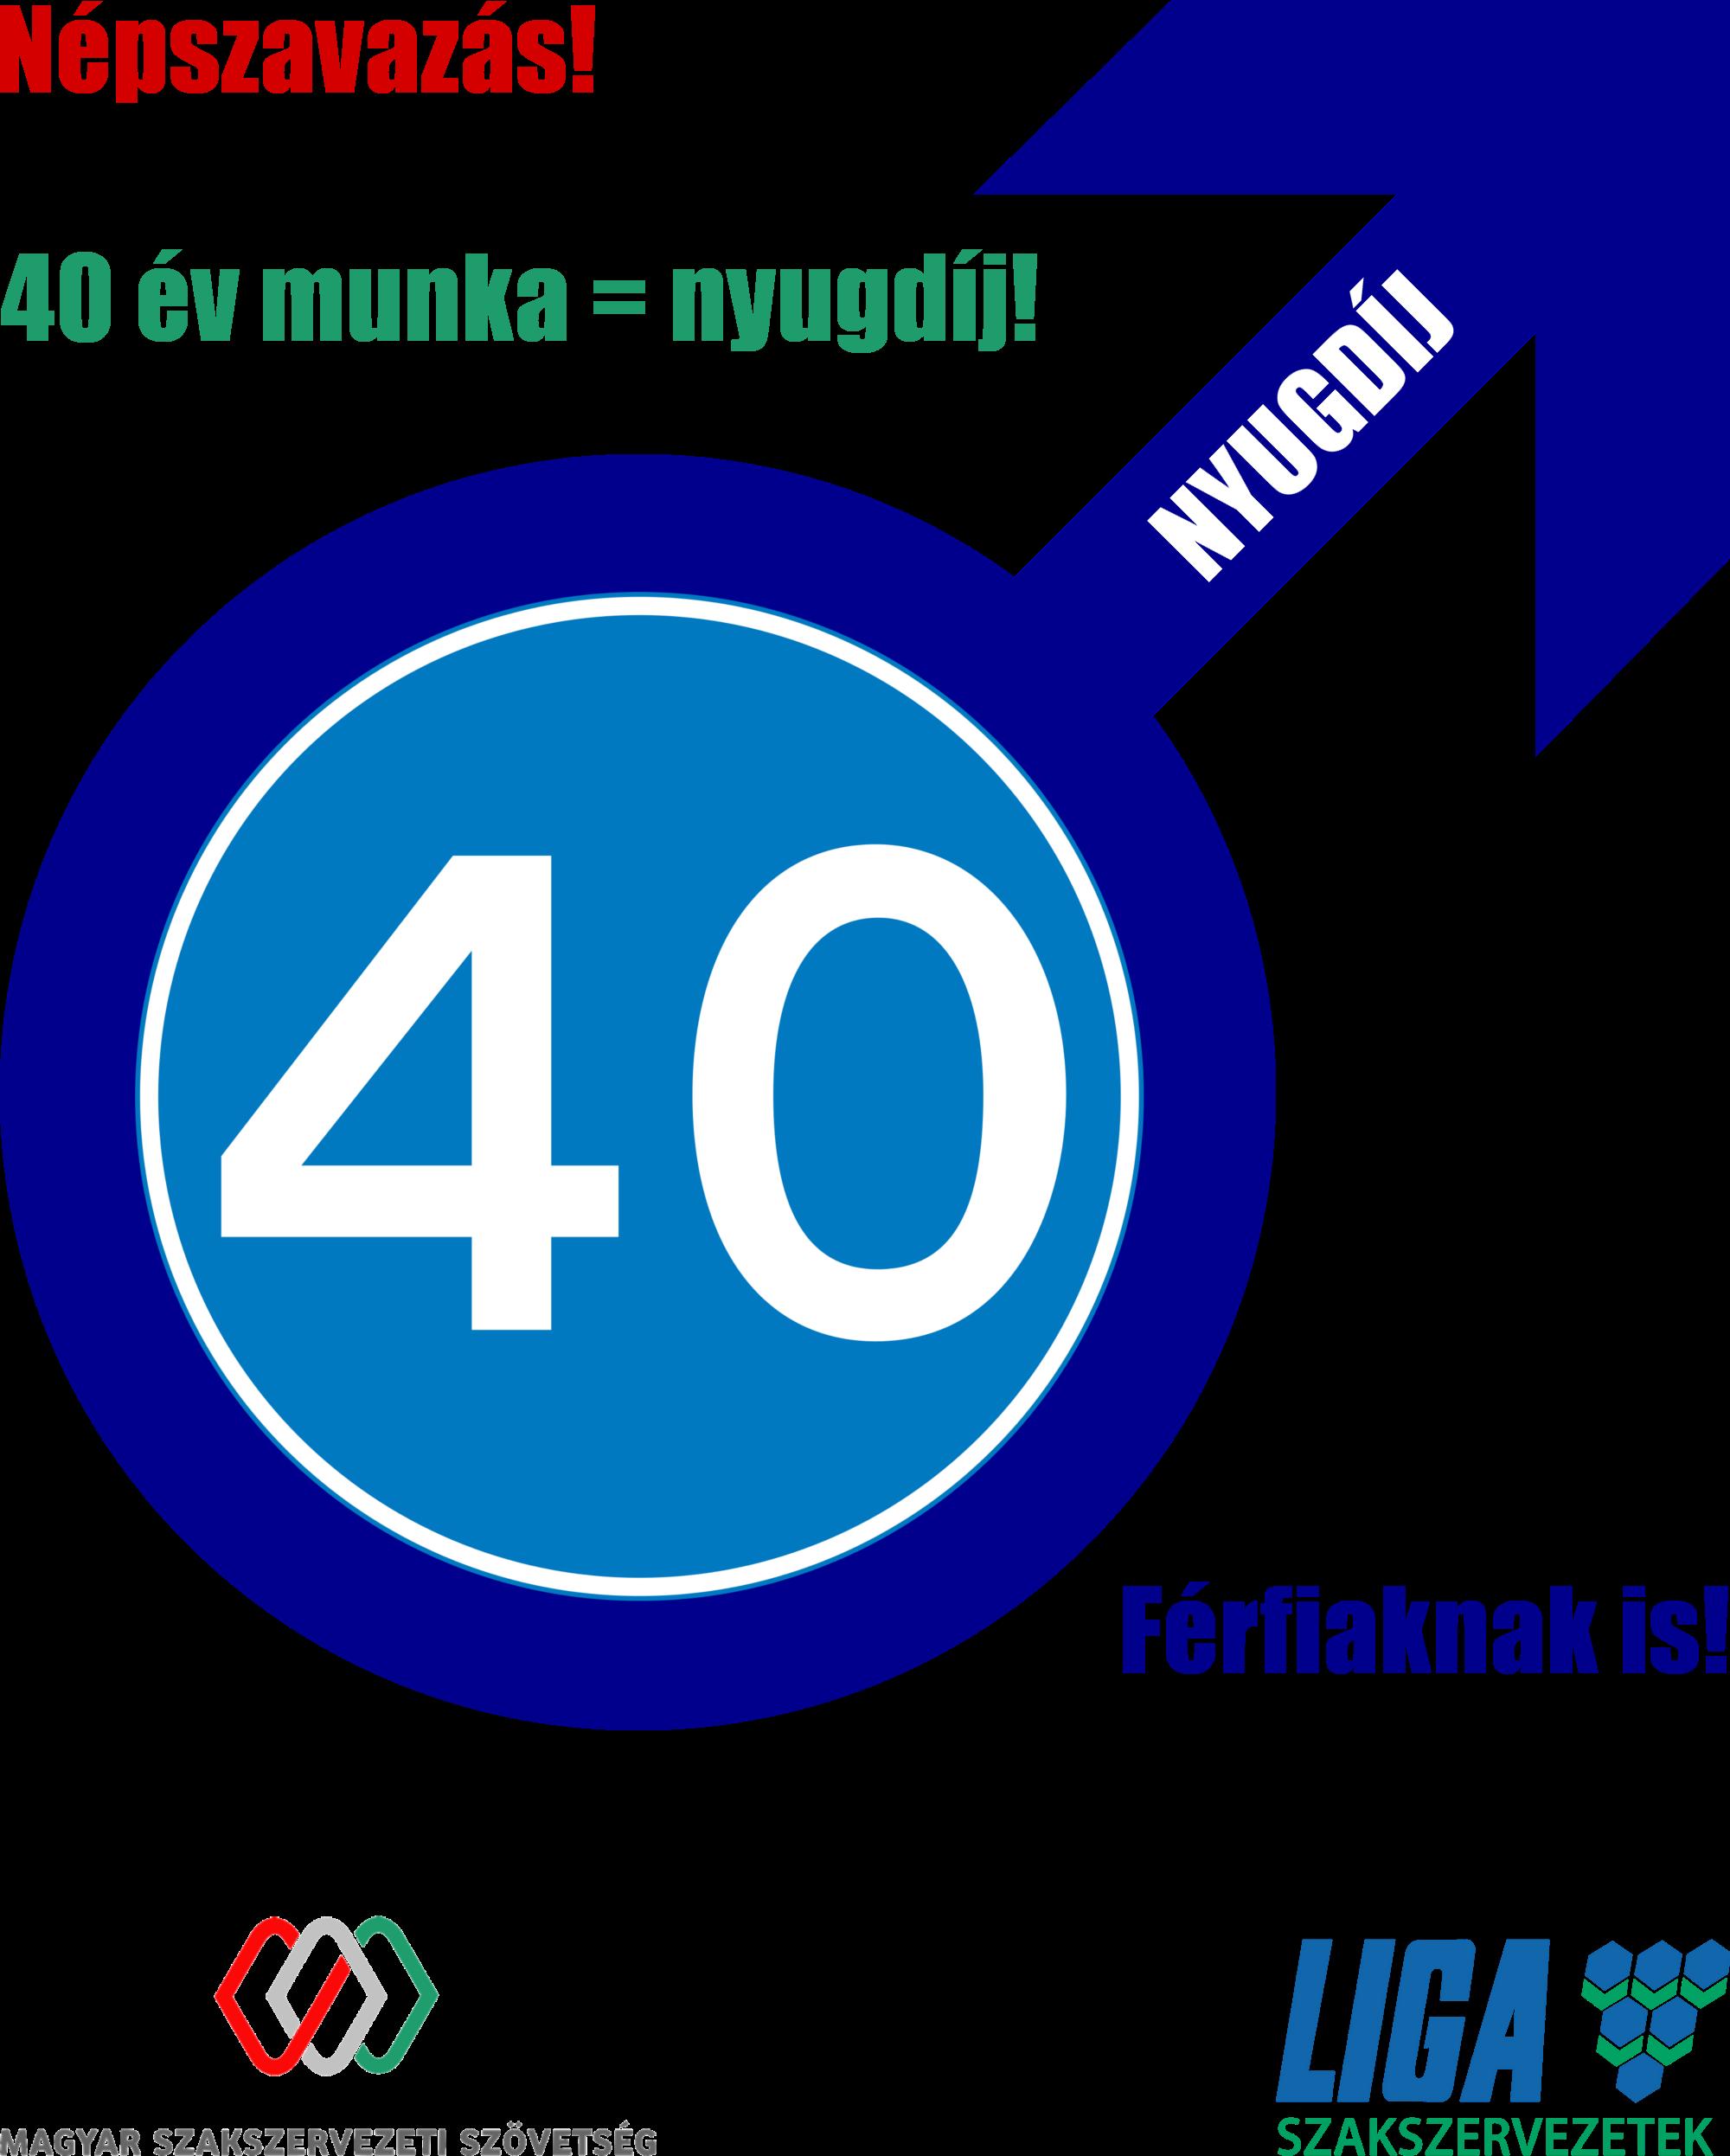 nyugdij40_nepszavazas_logo5.png